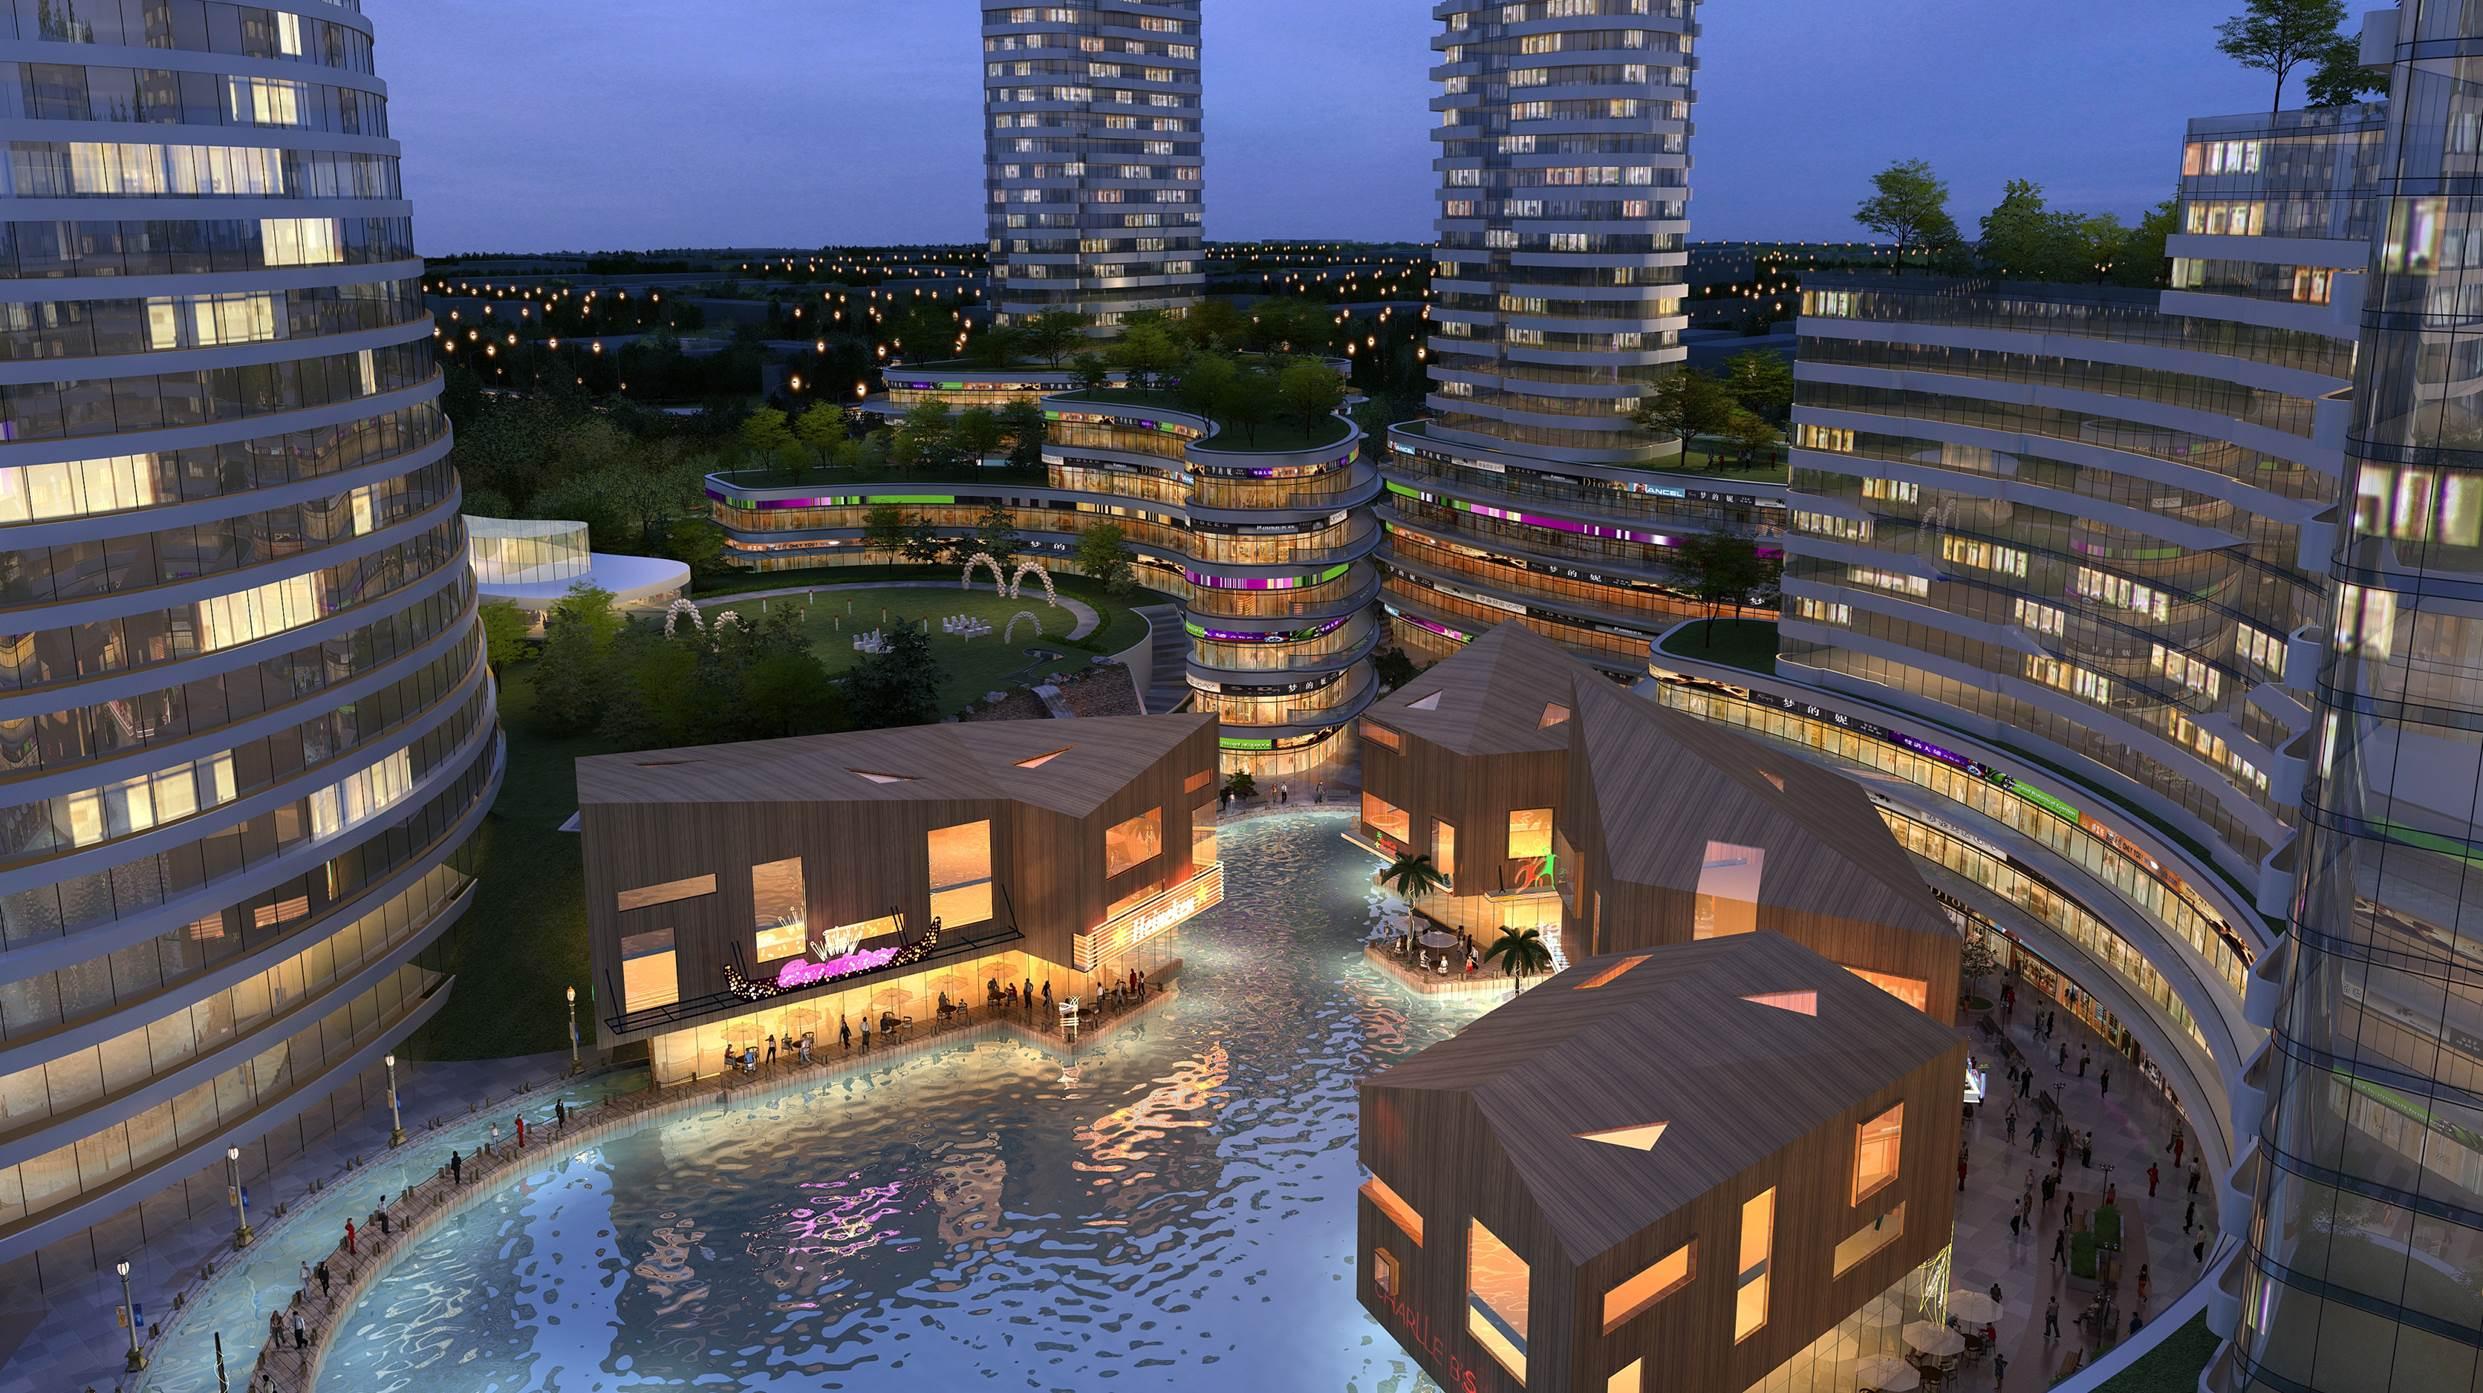 charles_tang_design_commercial_hotel_mixed-use_chengdu_china 5